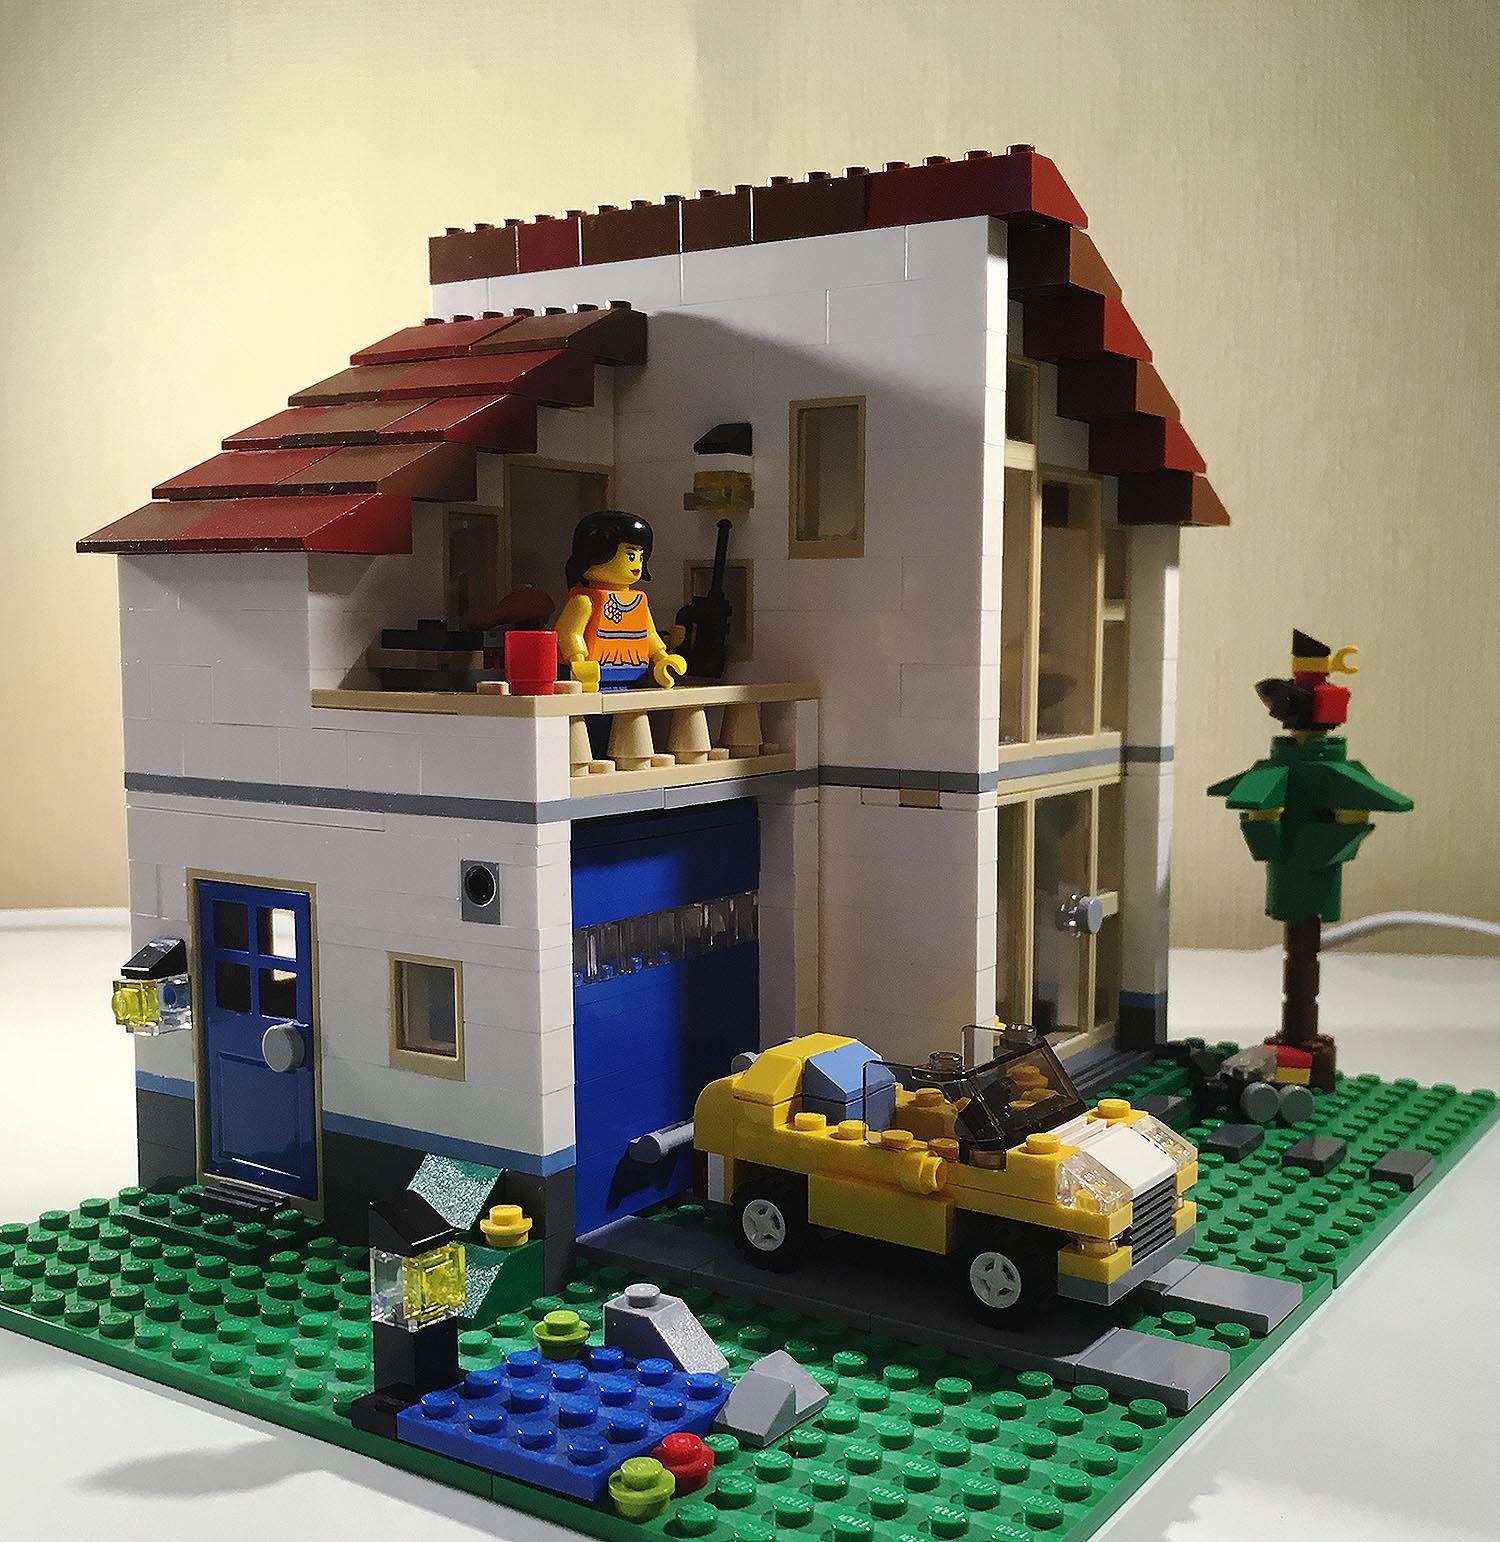 LEGO Creator Lego Haus und Stadtvilla